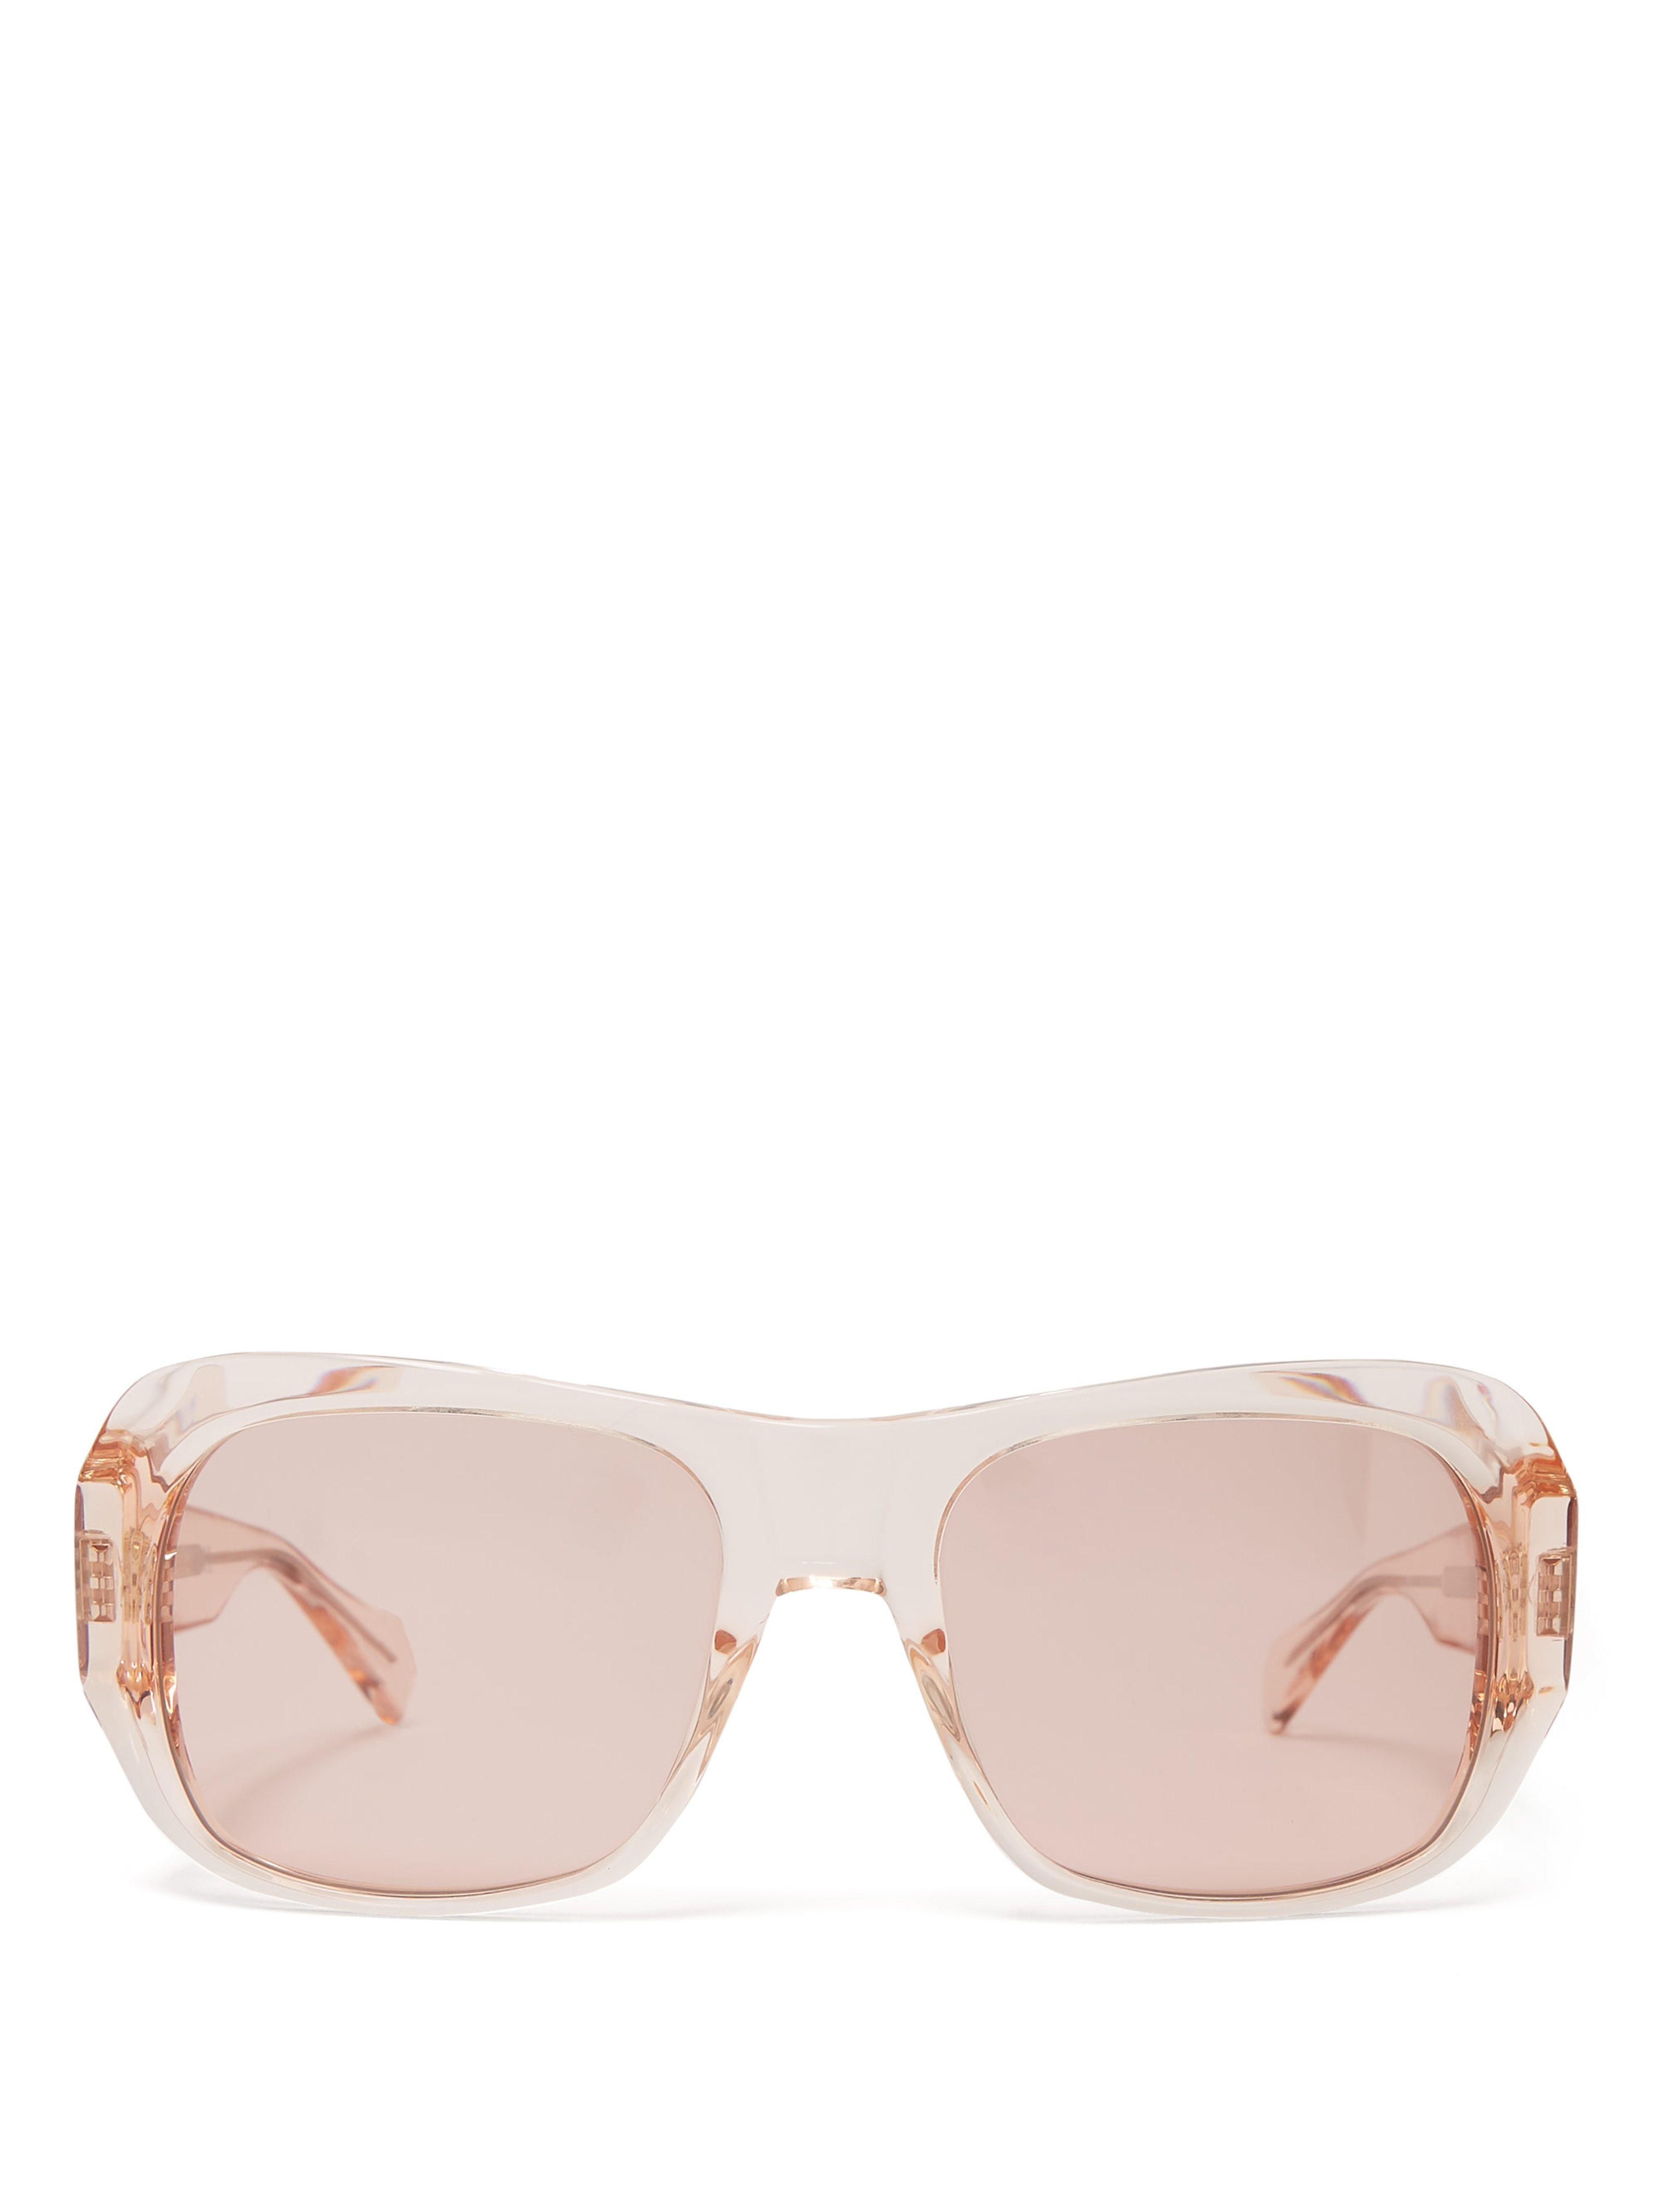 0f8c88baed0 Céline Rectangular Frame Acetate Sunglasses in Pink - Lyst